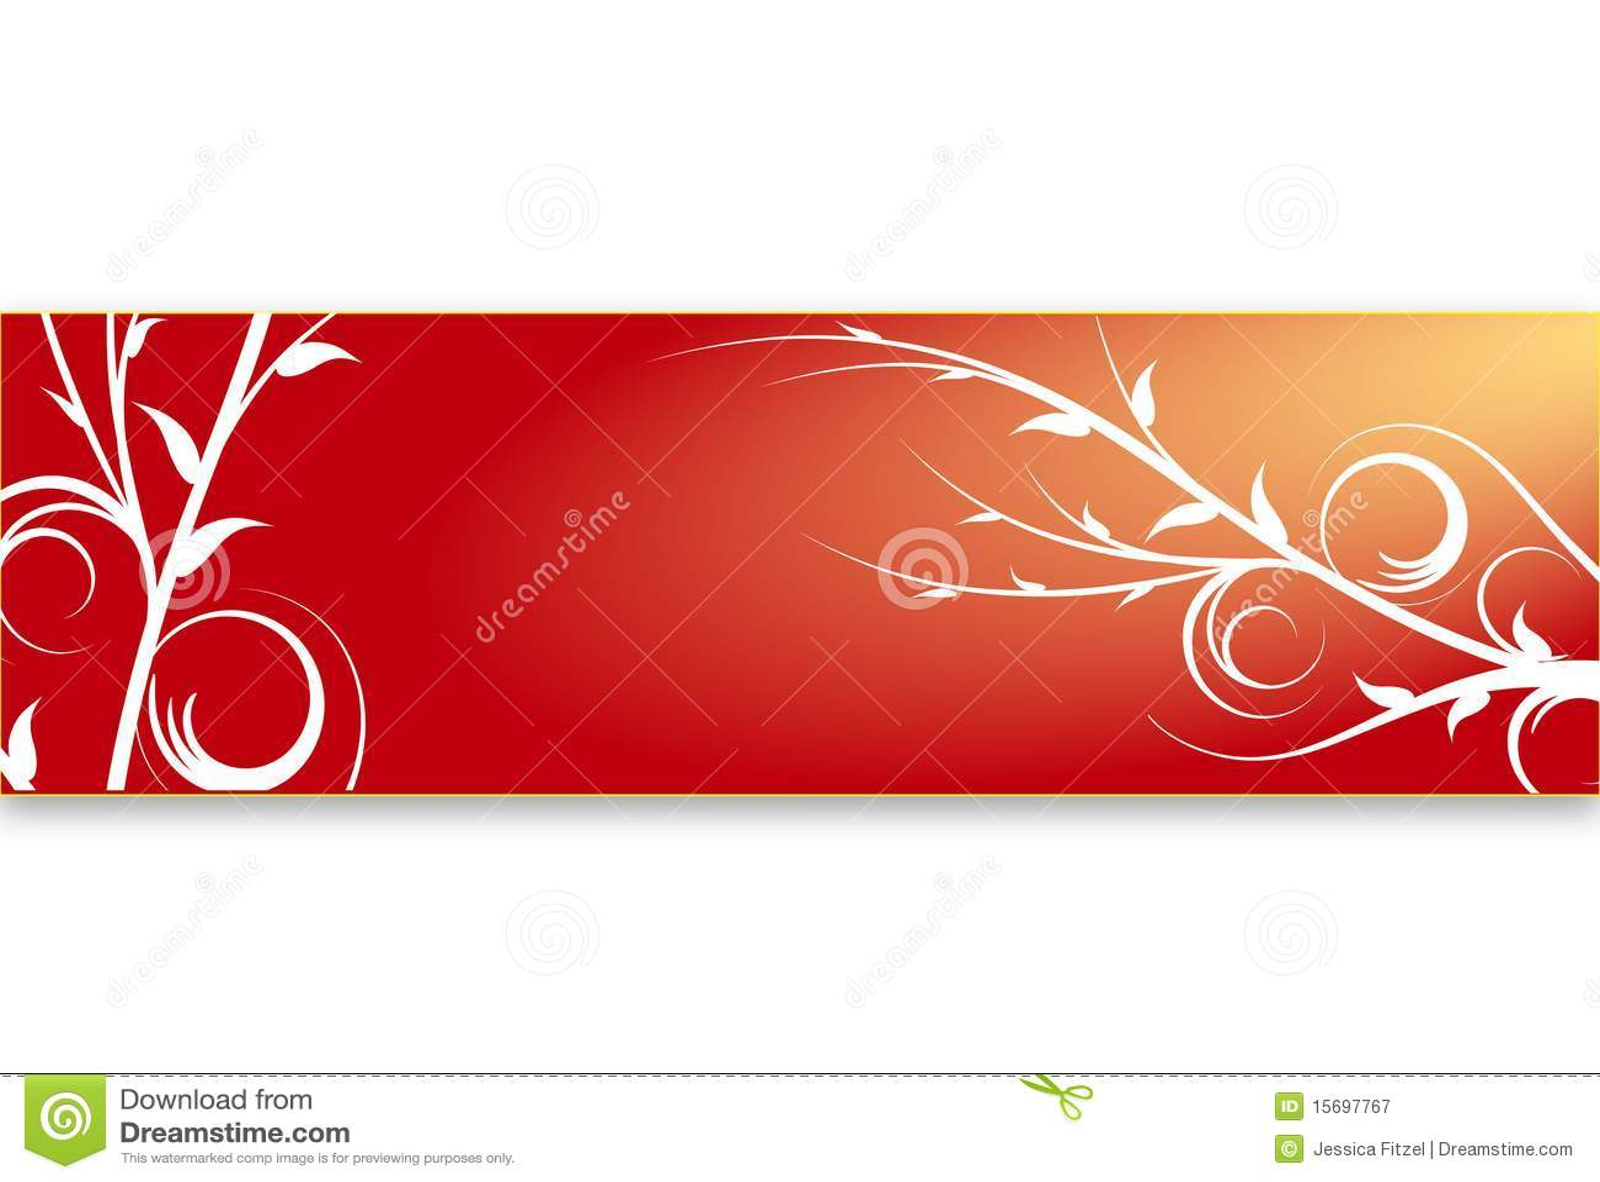 Red floral banner